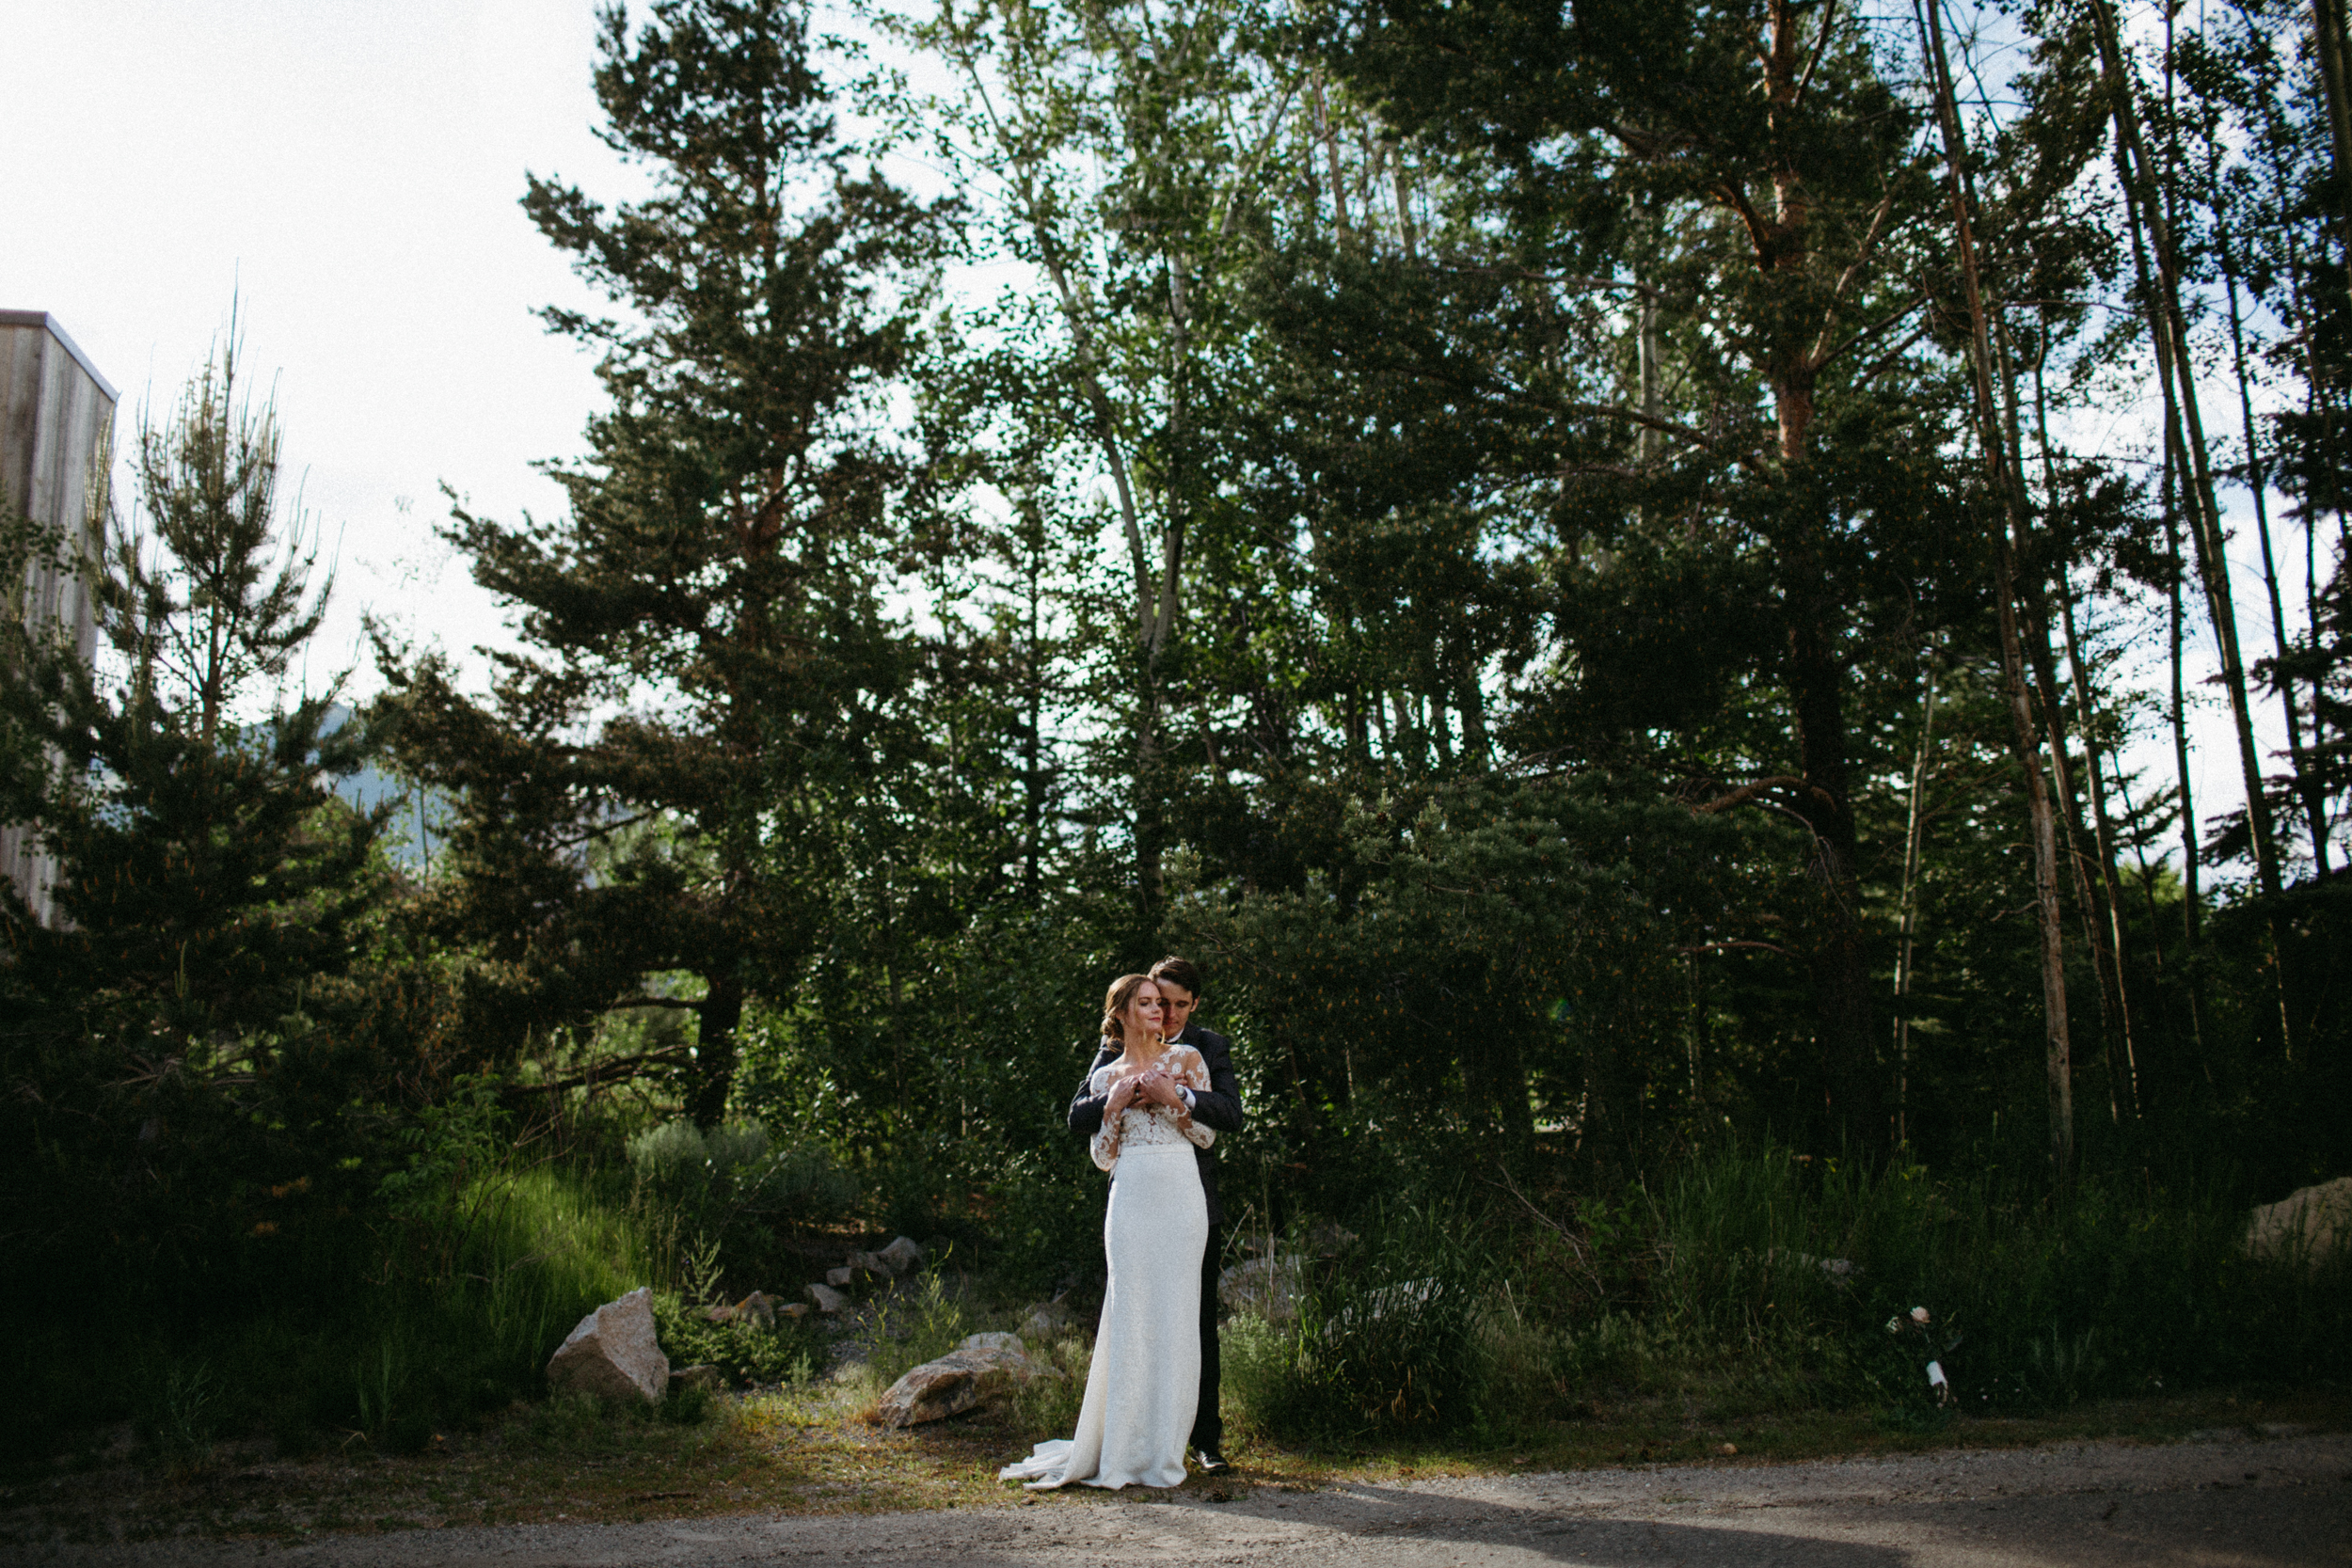 knob-hill-wedding-christinemarie-sun-valley-96.jpg